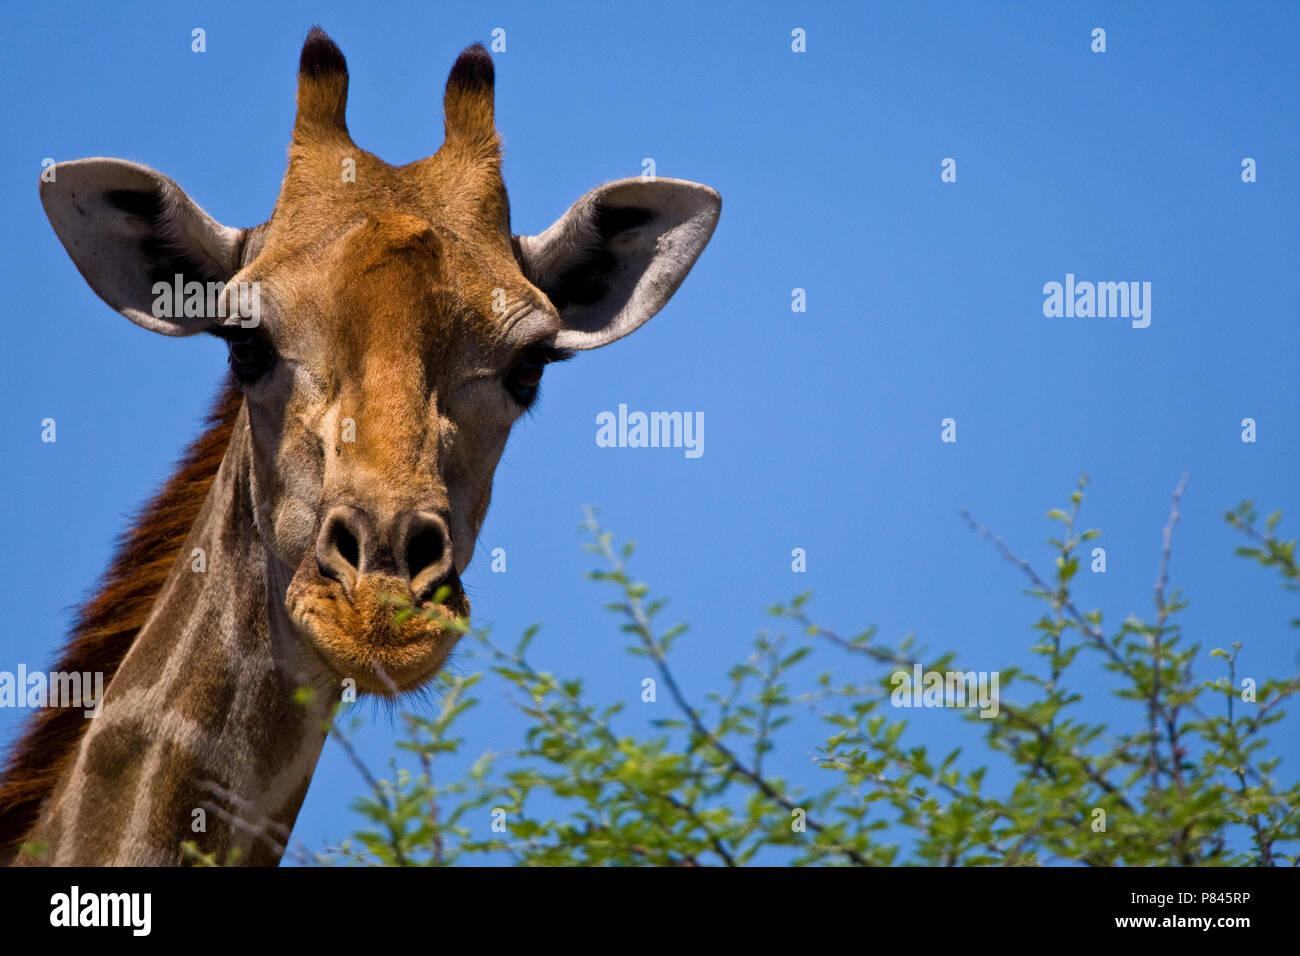 Giraffe closeup kop Namibie, Giraffe close-up head Namibia - Stock Image